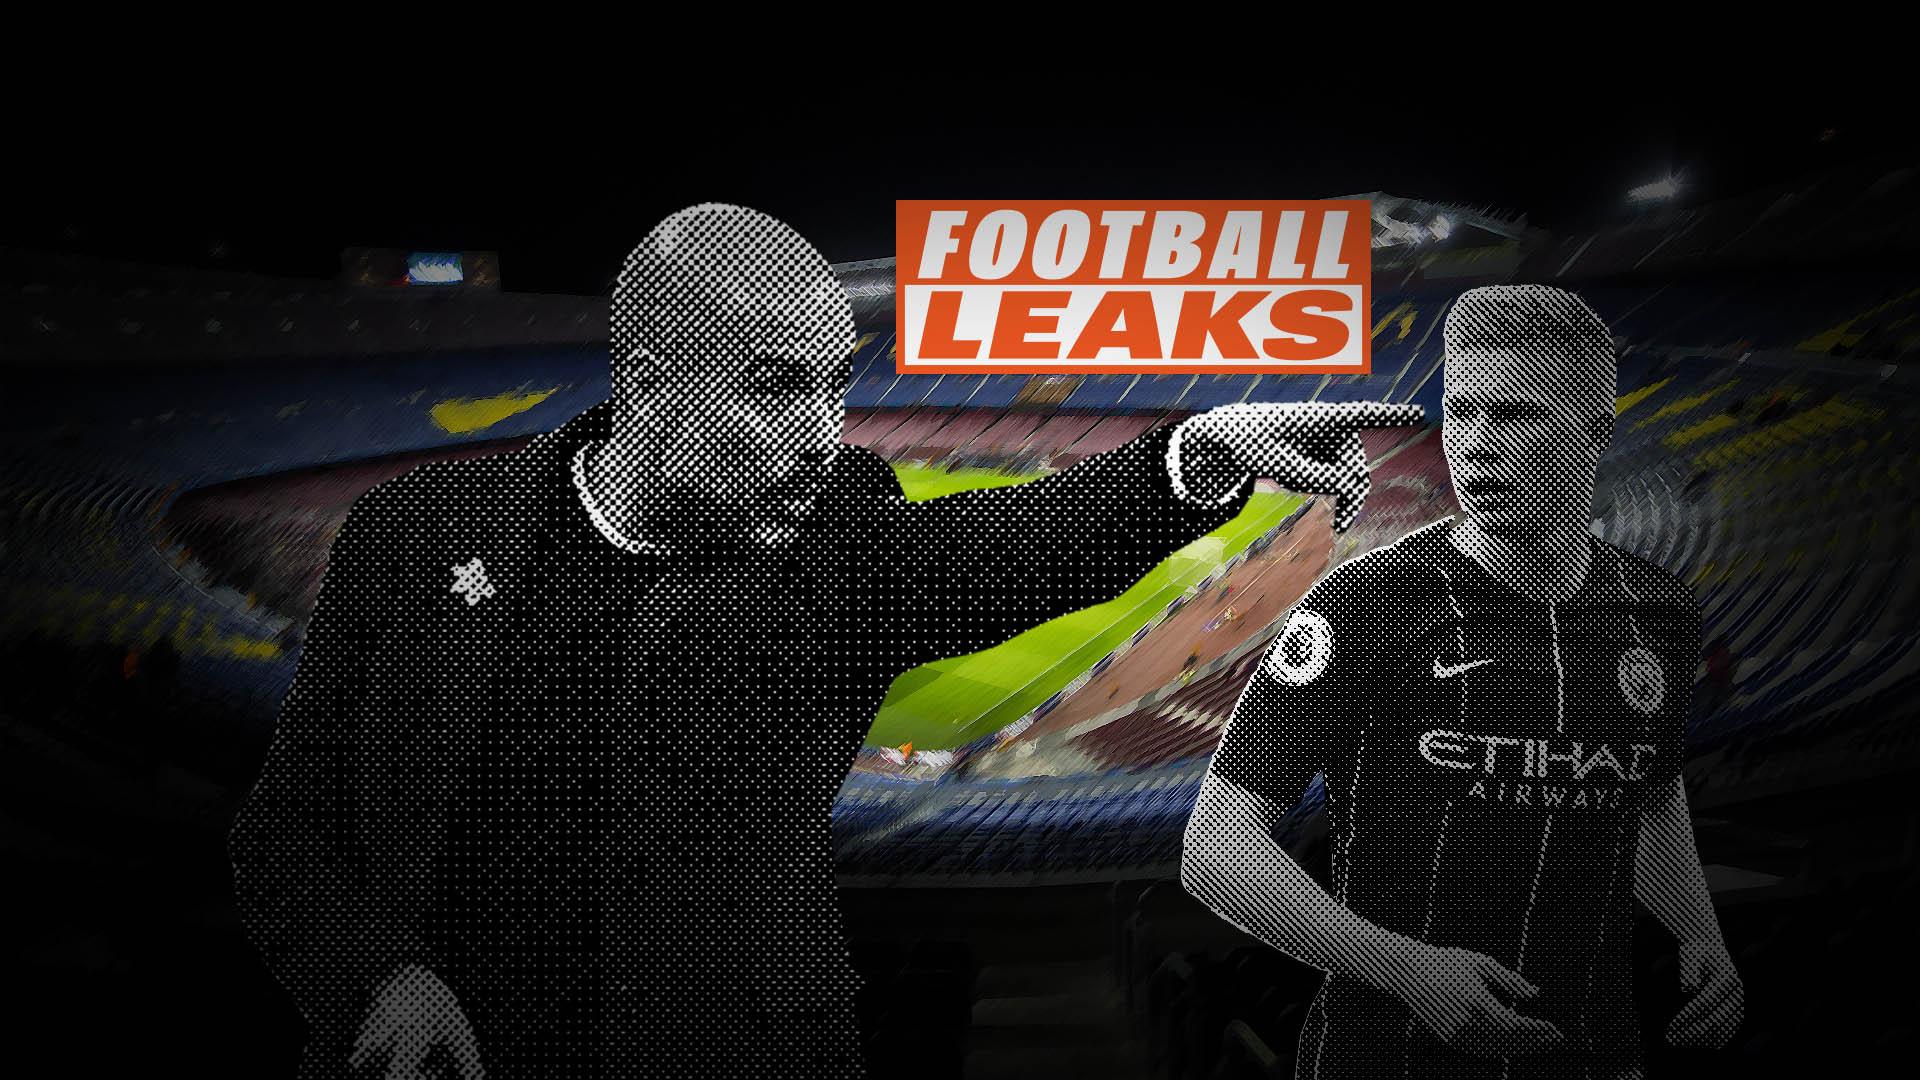 FOOTBALL LEAKS Manchester City – kriminal i tajni priljev novca u pozadini uspjeha